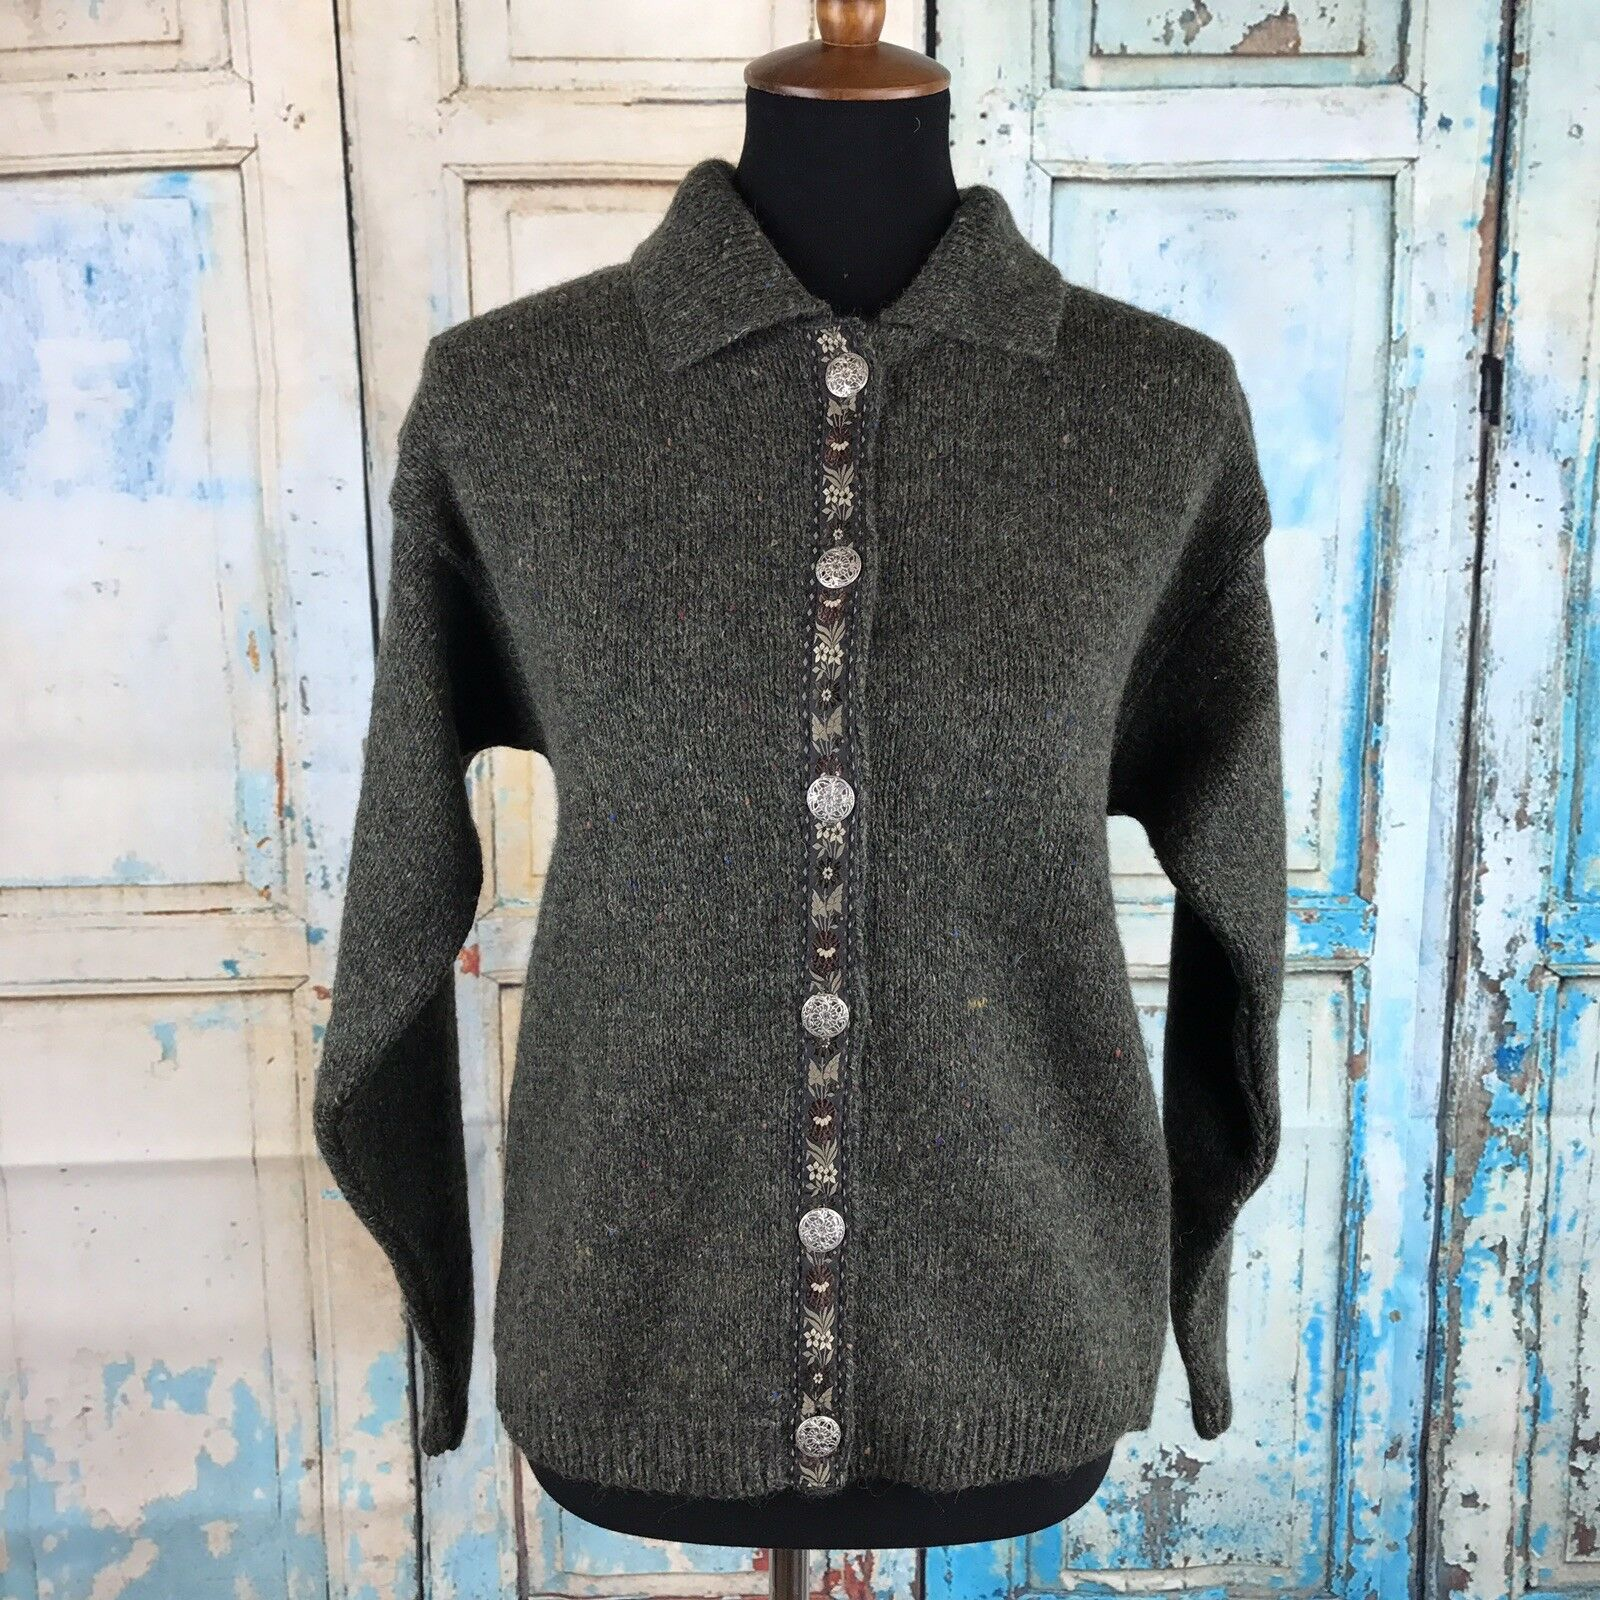 ALPS brand fine women's apparel sweater size M